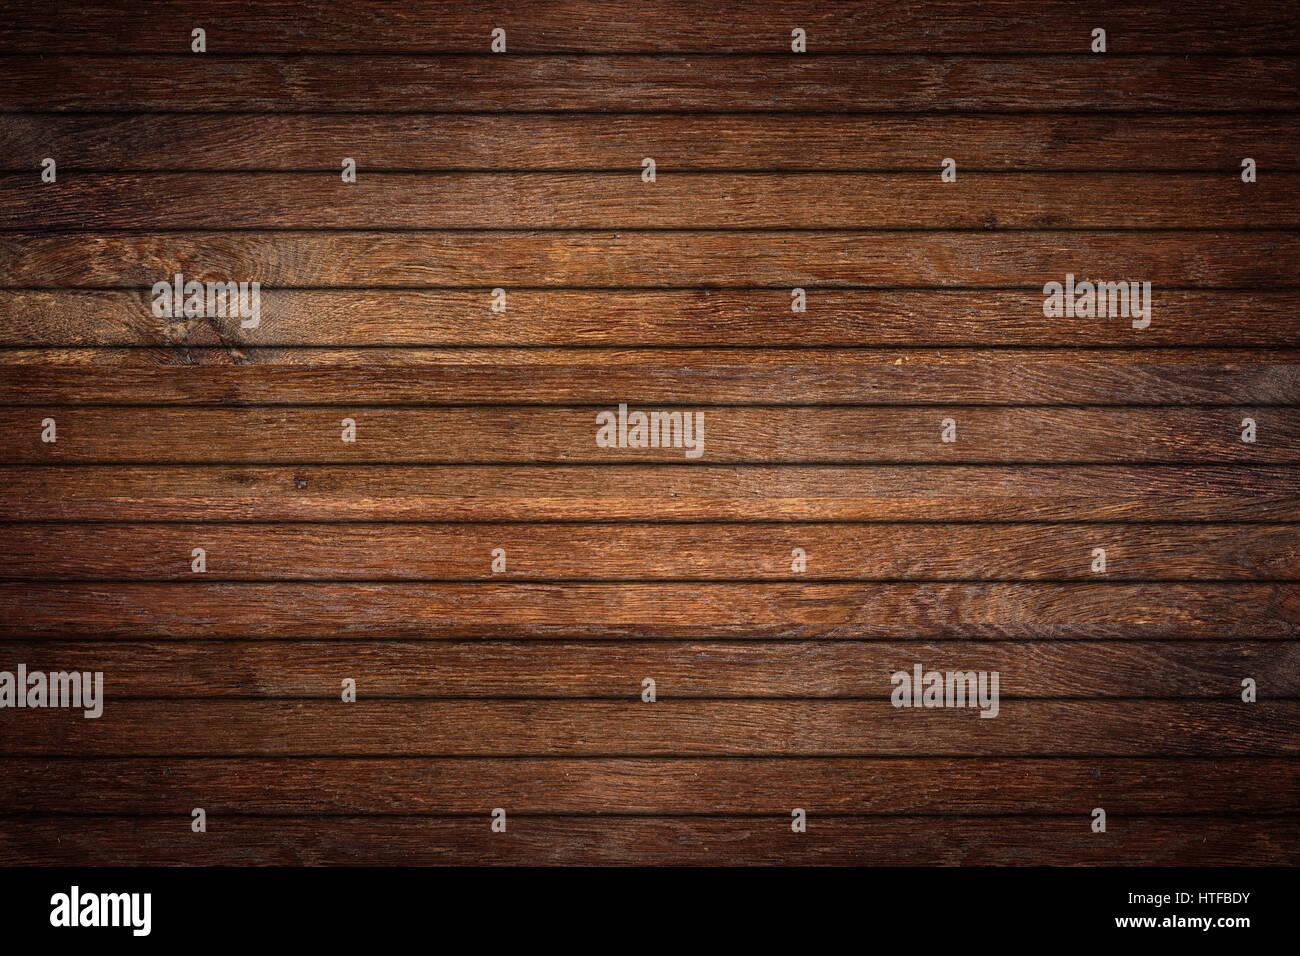 Planks rustic wood dark brown im genes de stock planks rustic wood dark brown fotos de stock - Tablones de roble ...